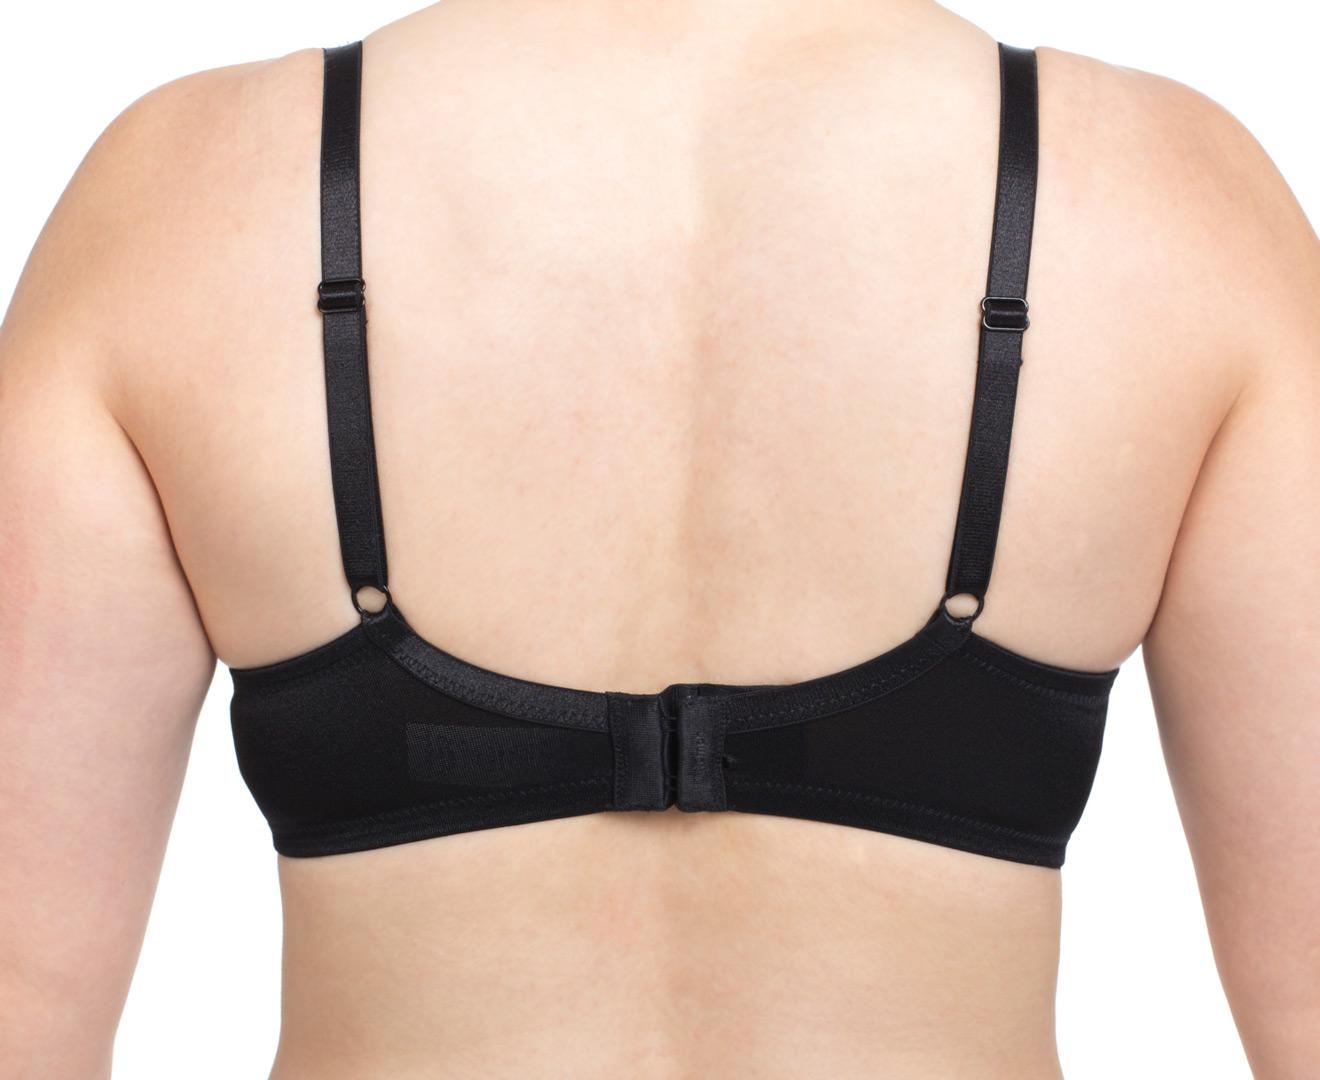 Triumph women 39 s pure luxury support w bra black ebay for Triumph t shirt bra